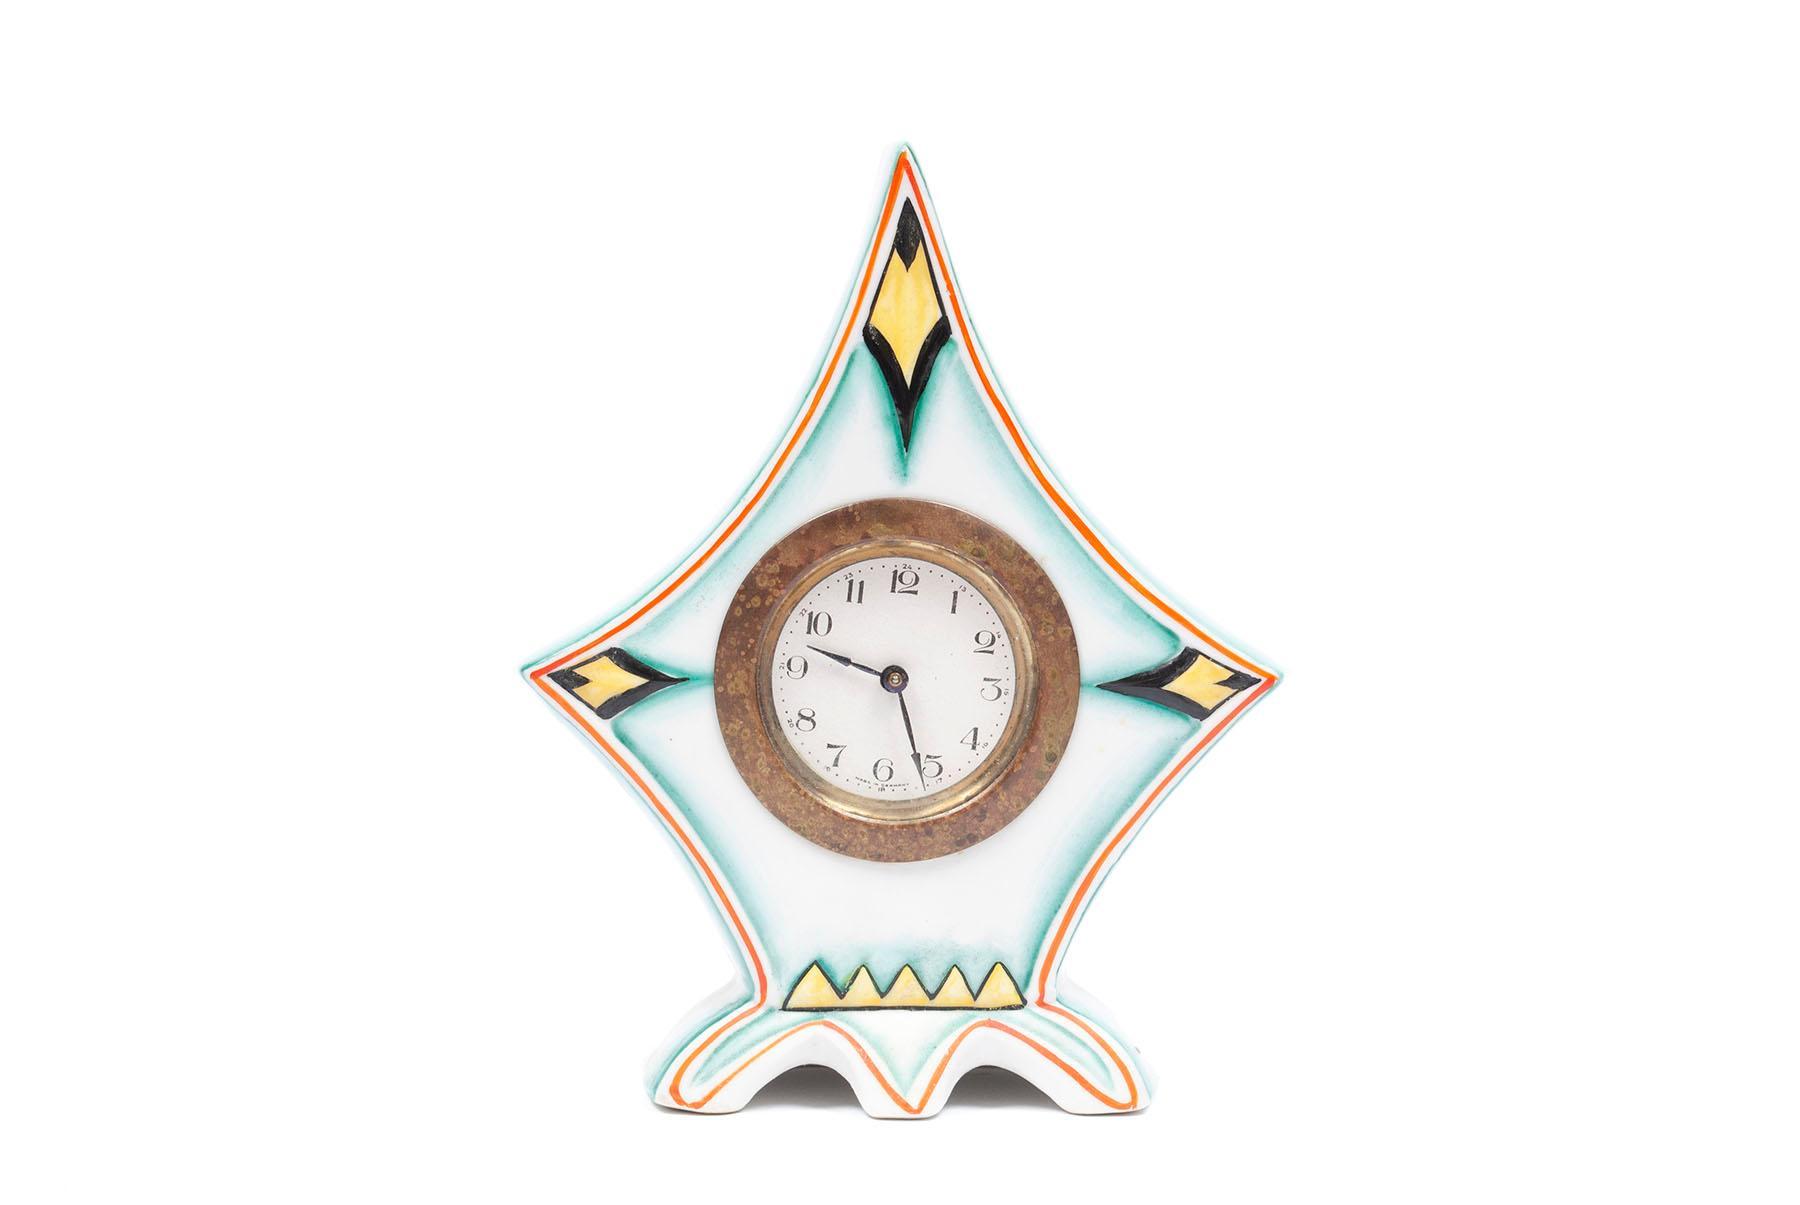 GERMAN ART DECO PORCELAIN CLOCK